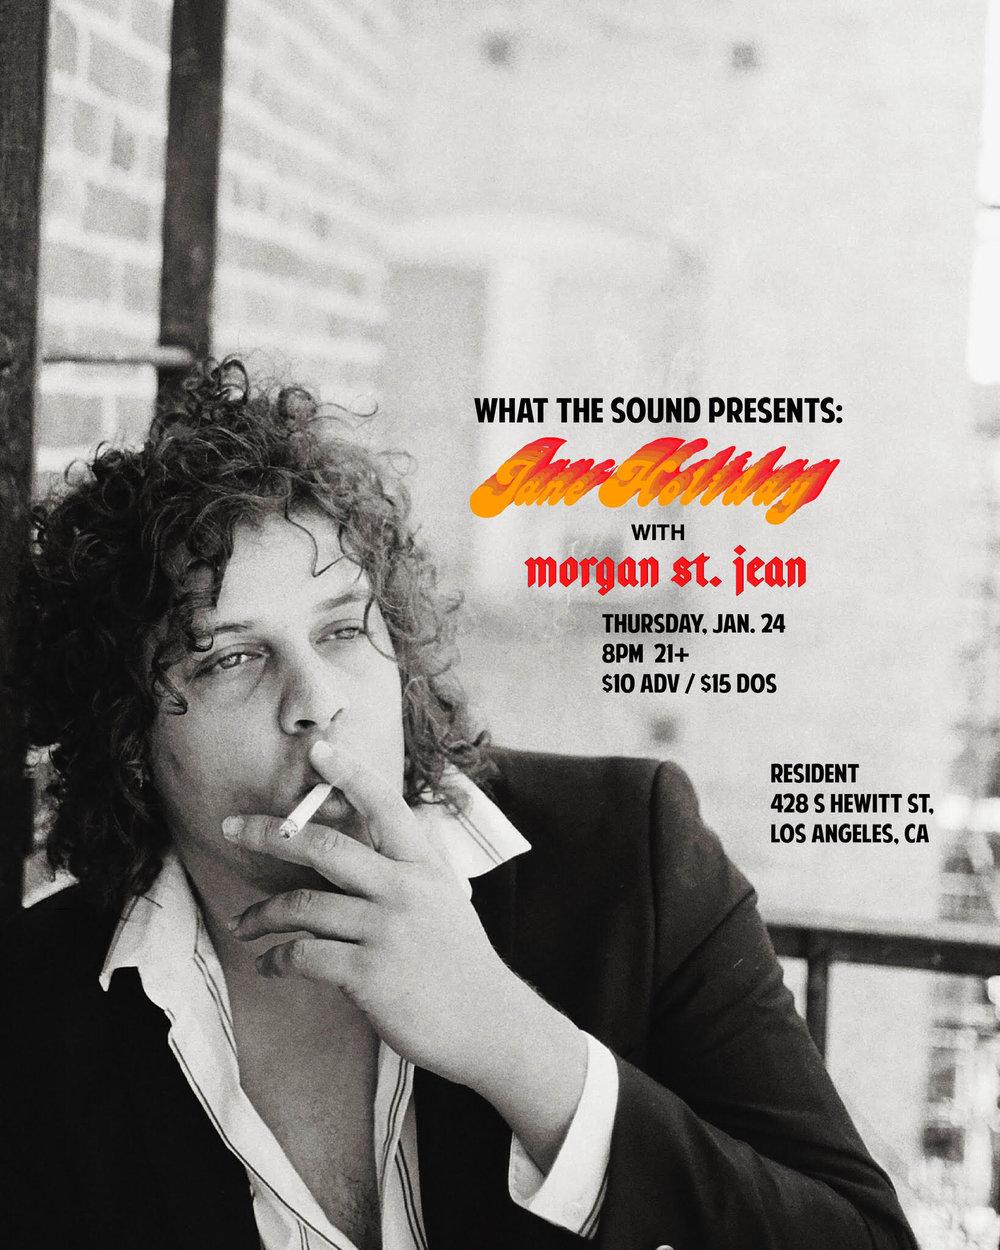 JANE HOLIDAY / MORGAN ST. JEAN - January 24, 2019 @ Resident$10 ADV / $15 DOS21+